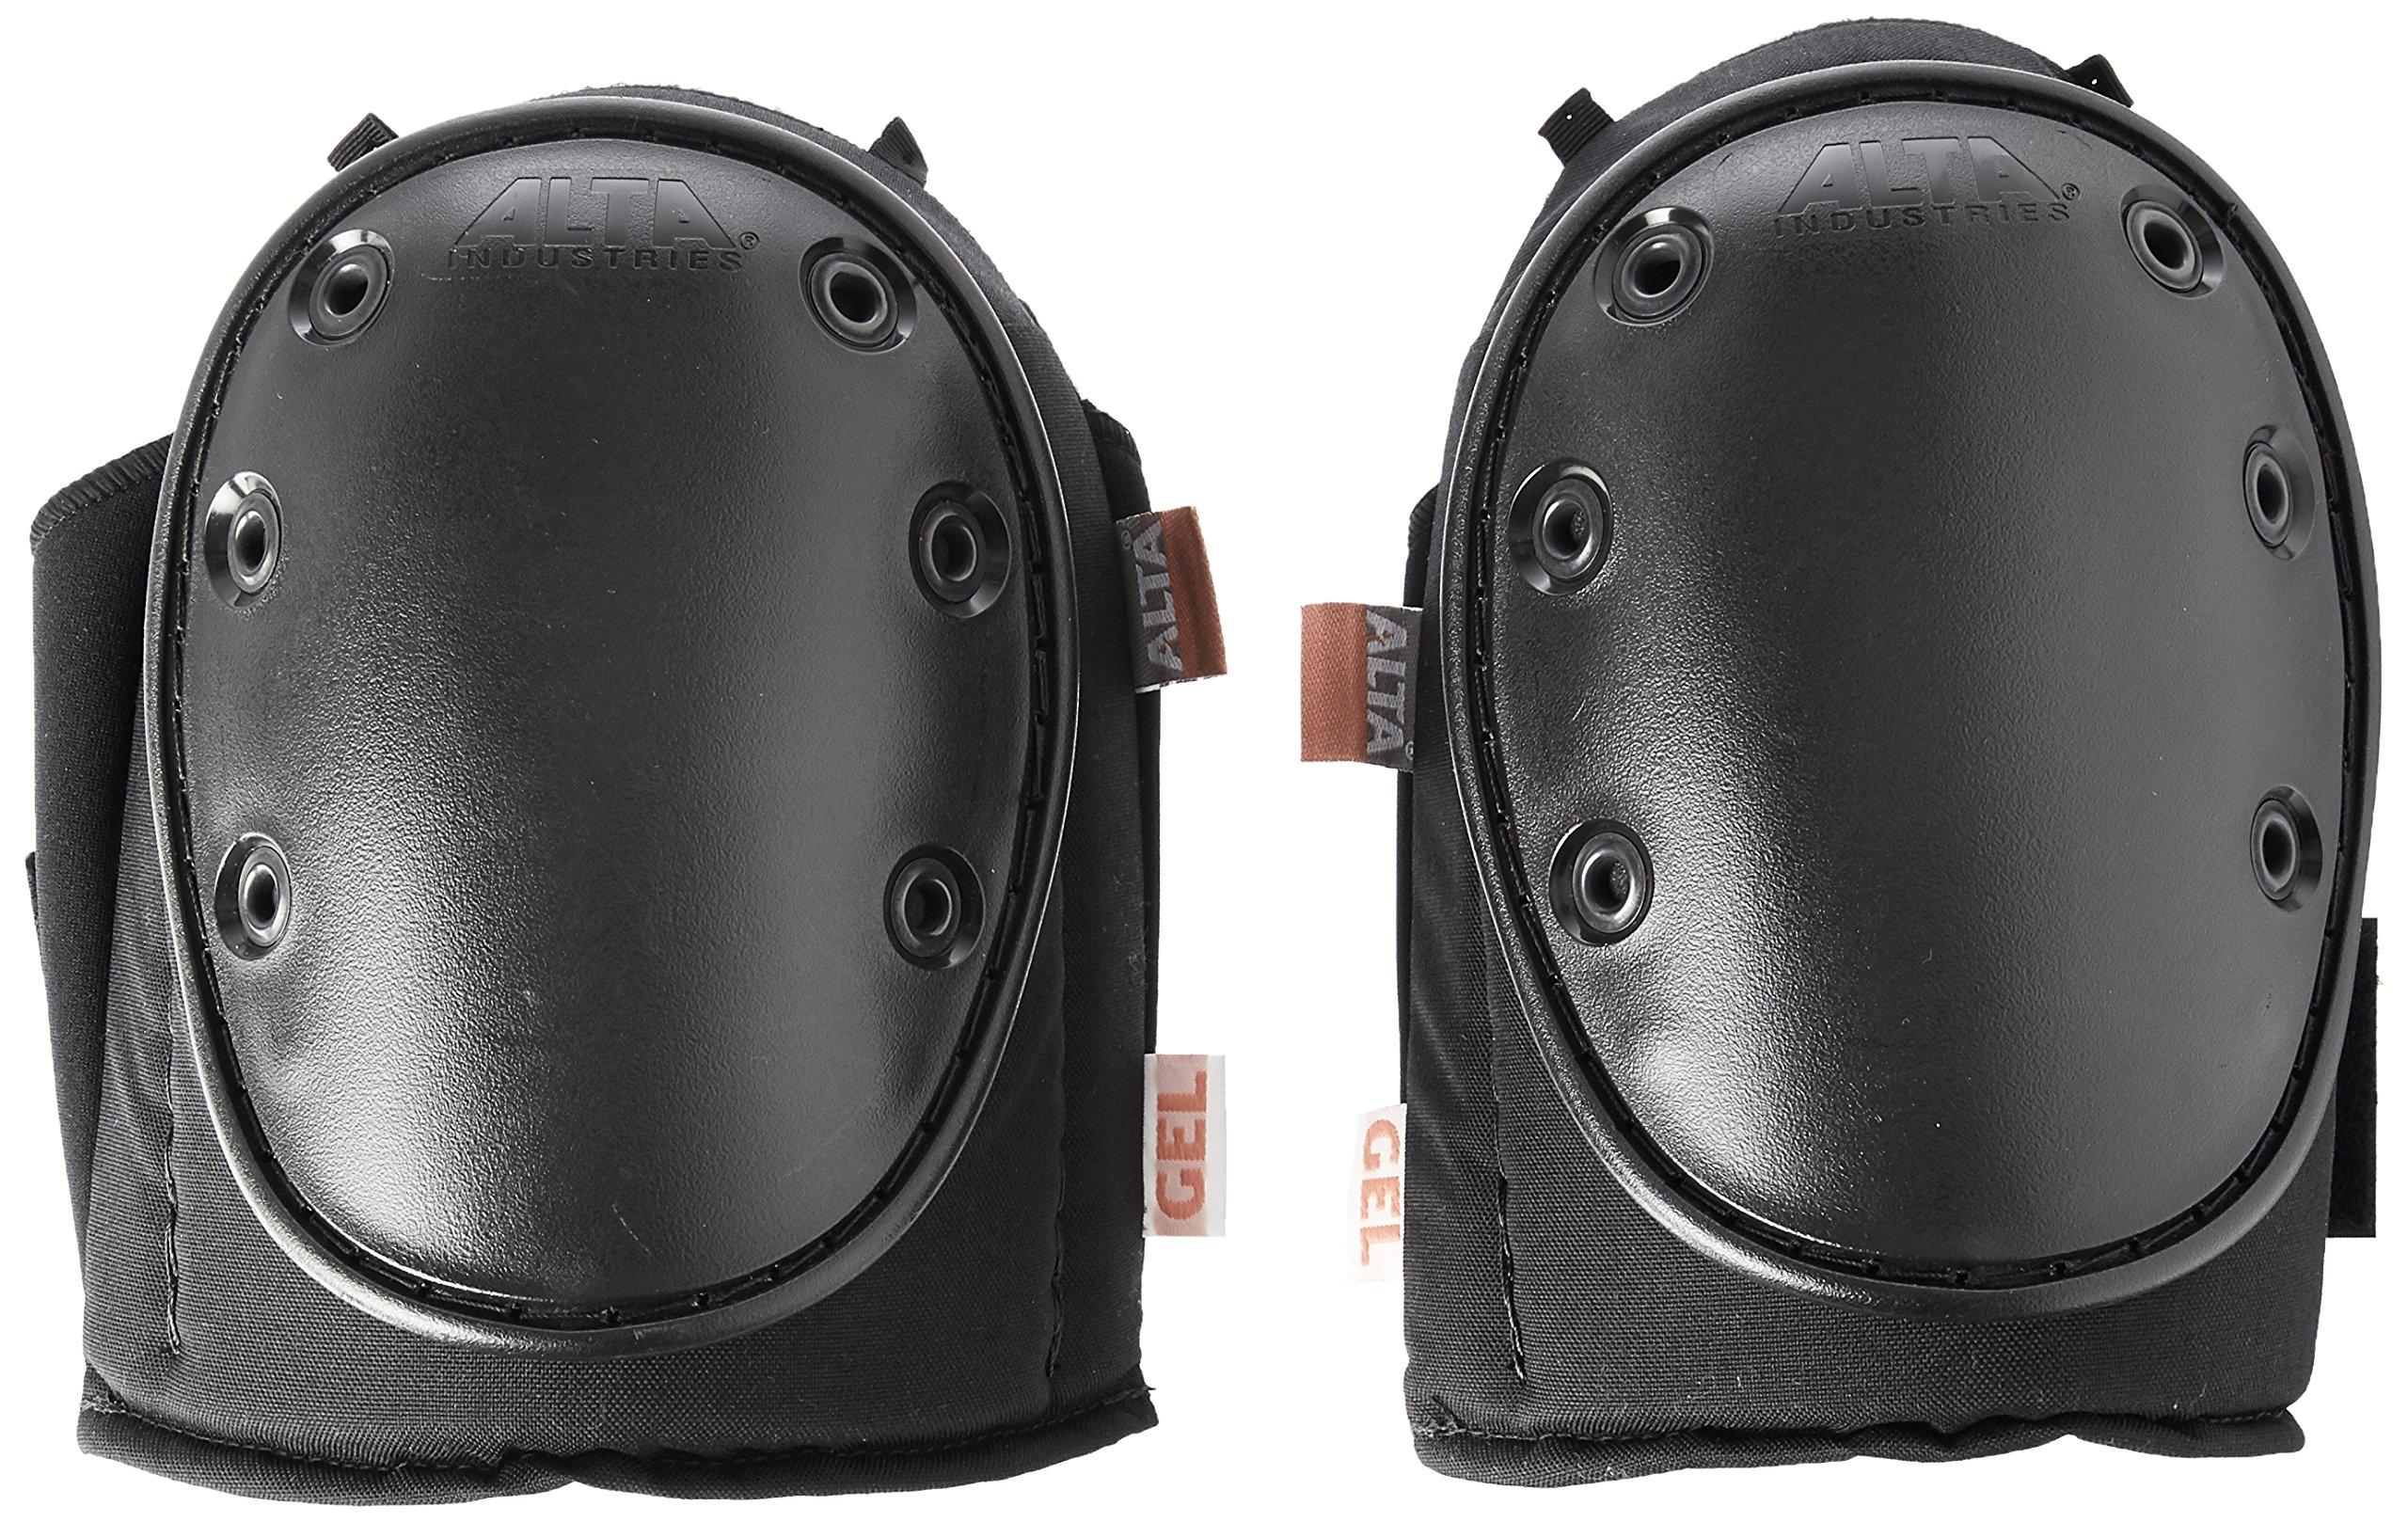 ALTA 56200 AltaGUARD GEL Insert Knee Protector Pads, Black Cordura Nylon Fabric, Neoprene Grip, Hard Cap, Long, Black